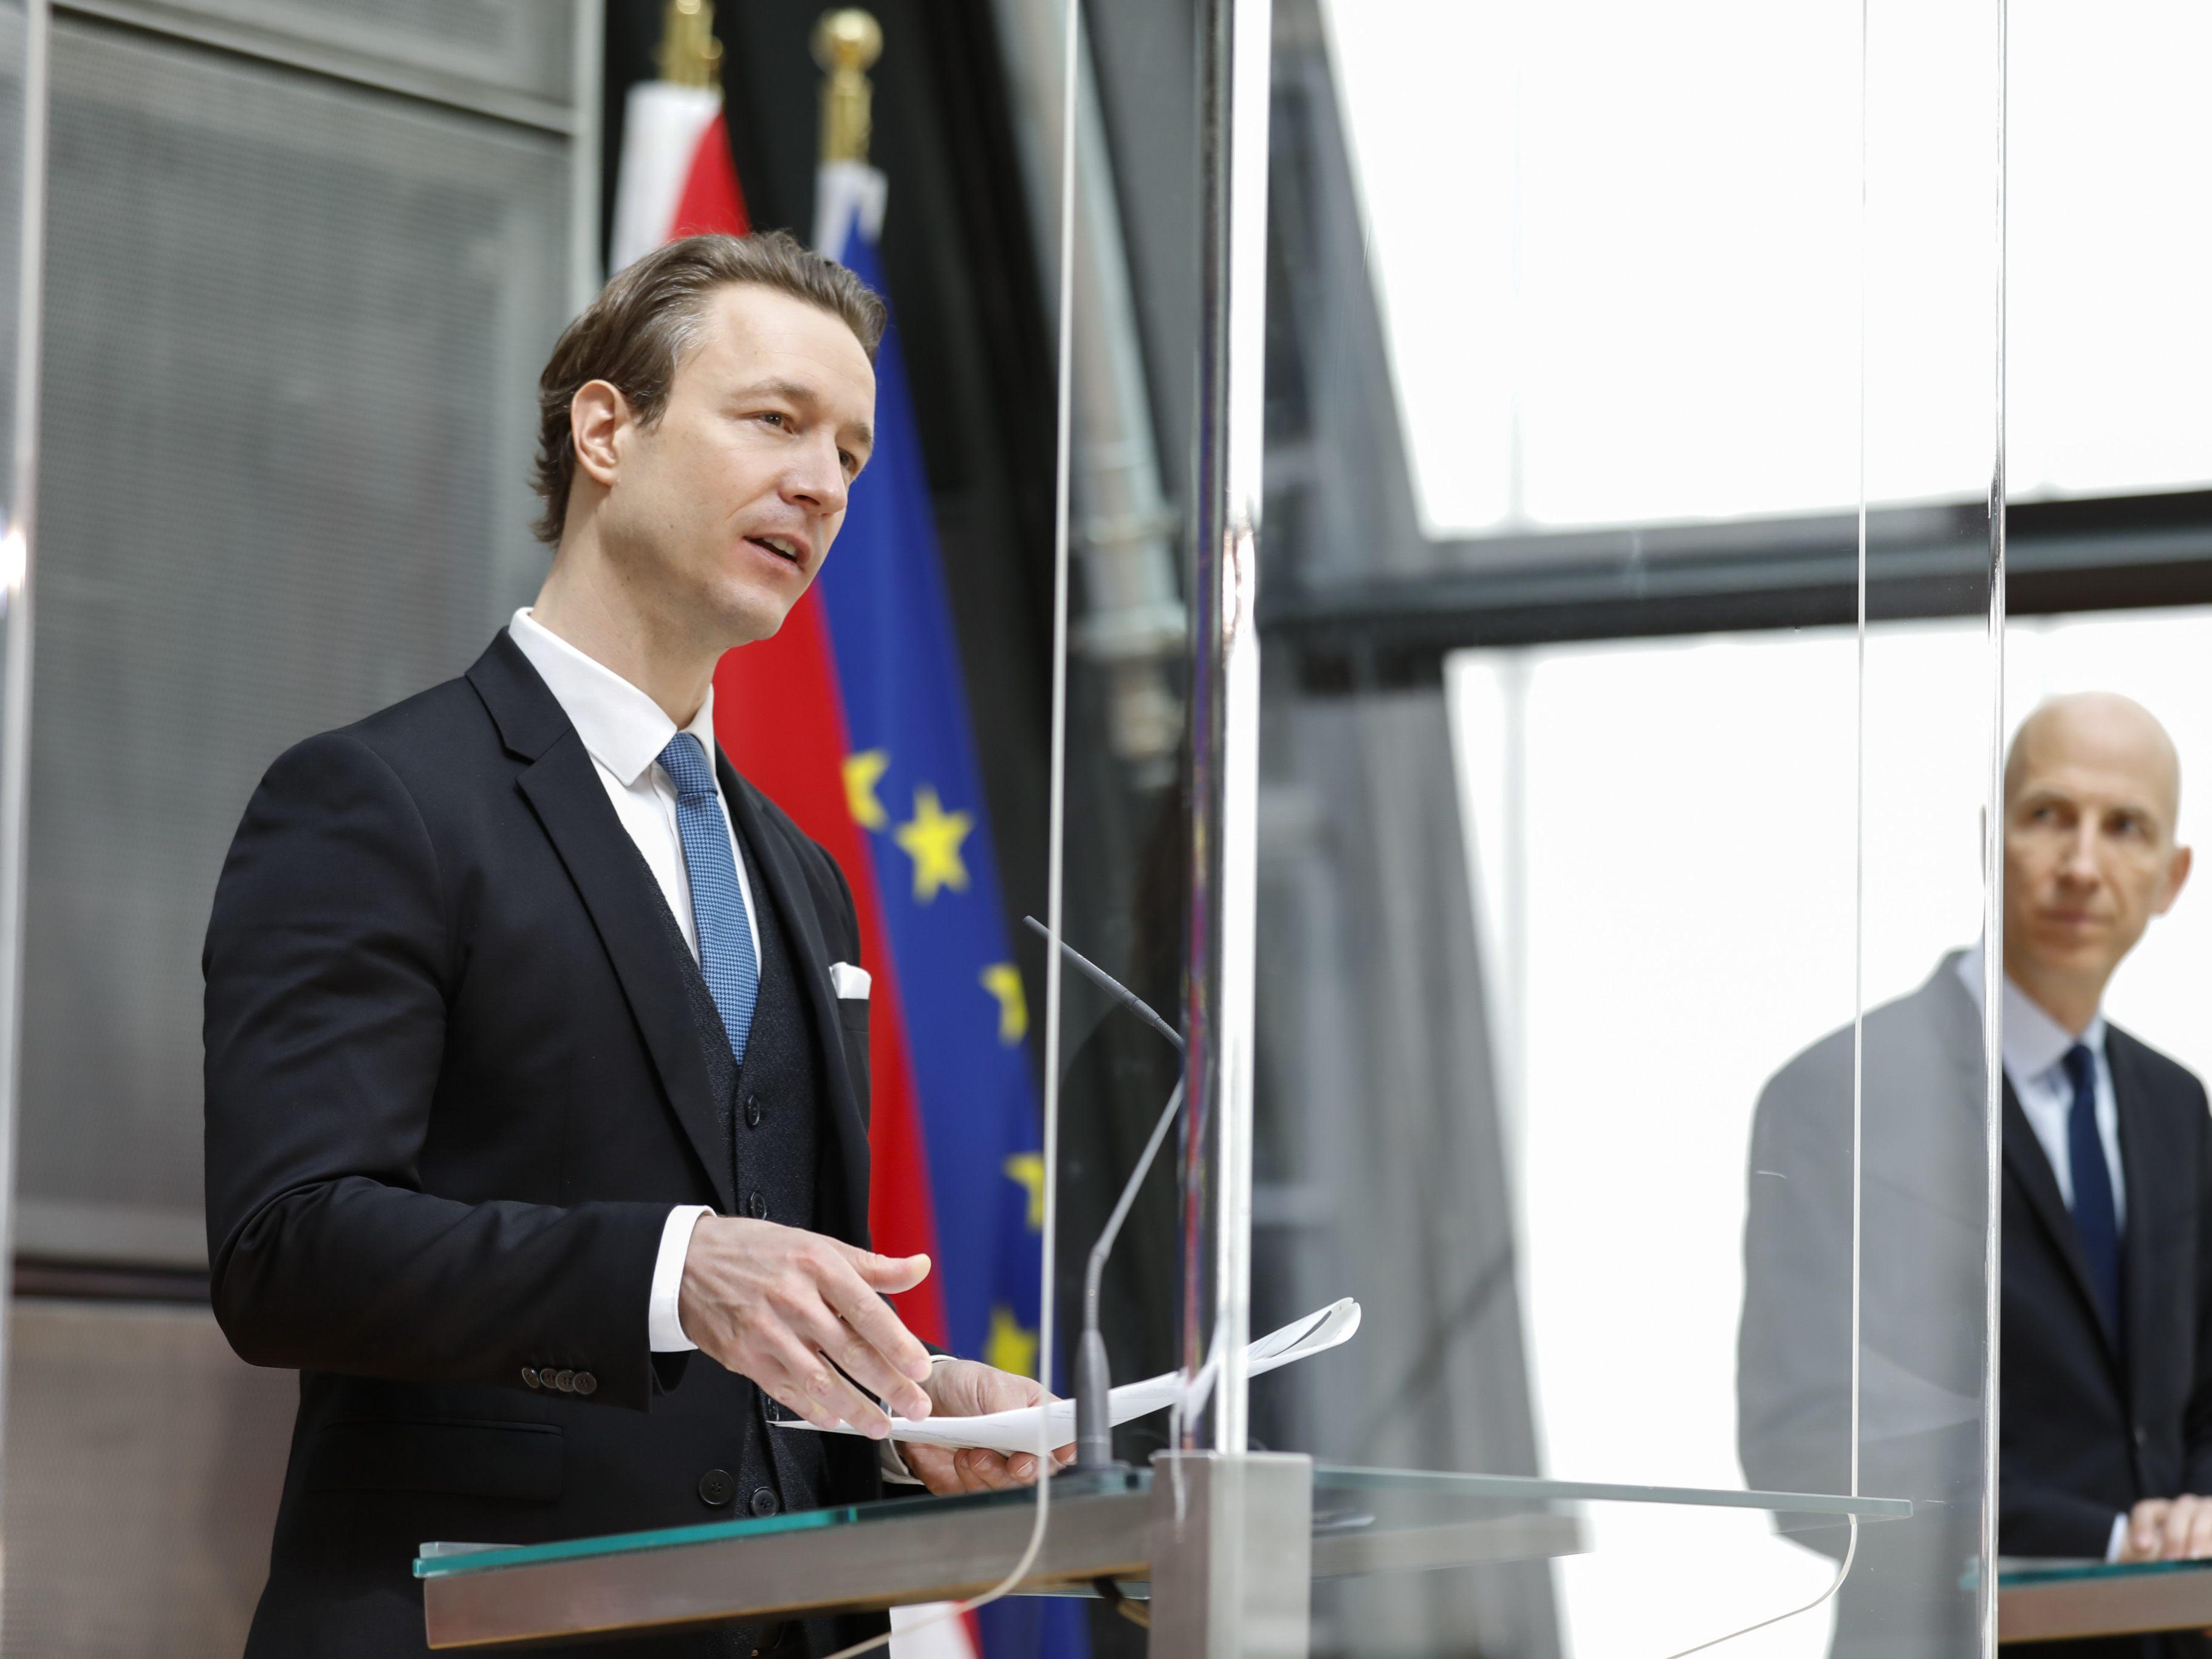 Live-Pressefoyer-nach-dem-Ministerrat